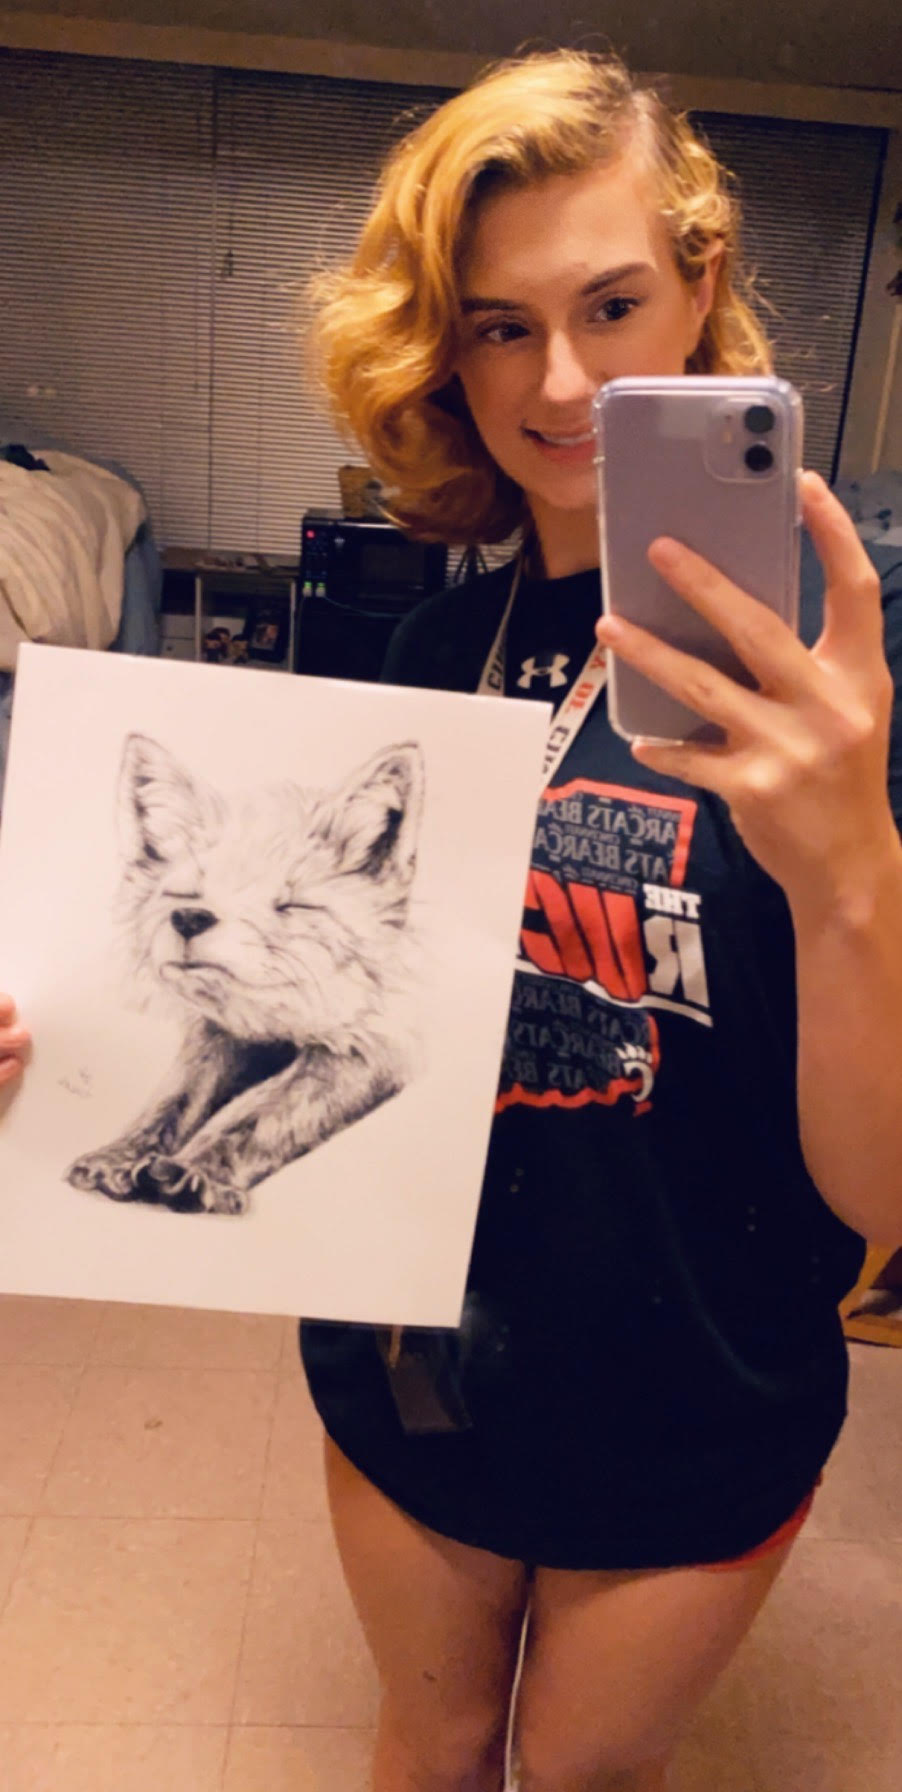 Cincinnati Comic Expo Drawing Winner